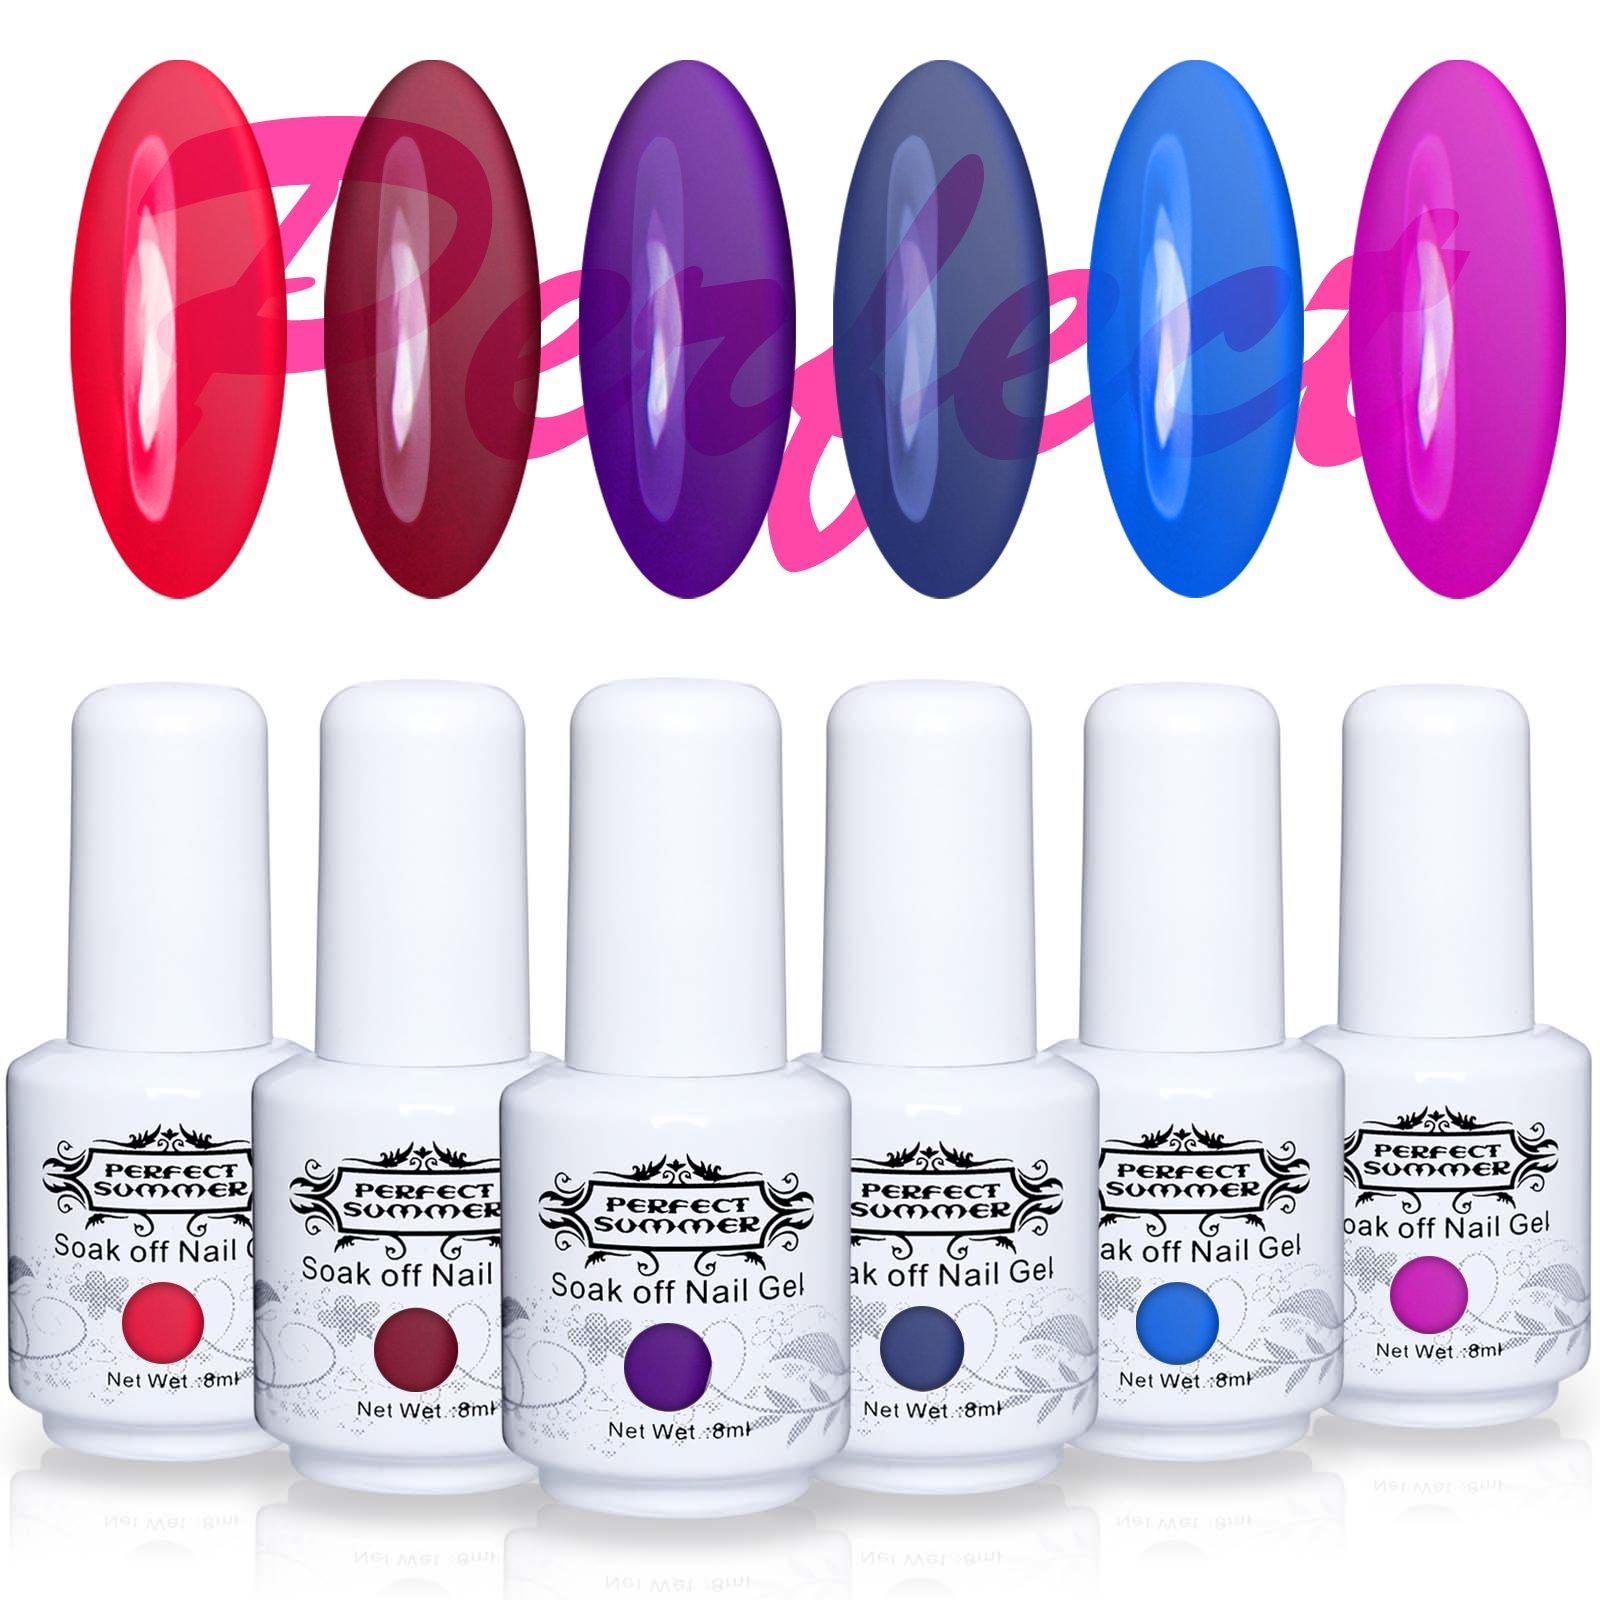 Perfect Summer 6PCS Soak Off UV Gel Glass Polish Translucent Jelly Look Crystal Gel Polish 8ML Color Nail Gel Polish Manicure Kit Gift Set #043 by Perfect Summer